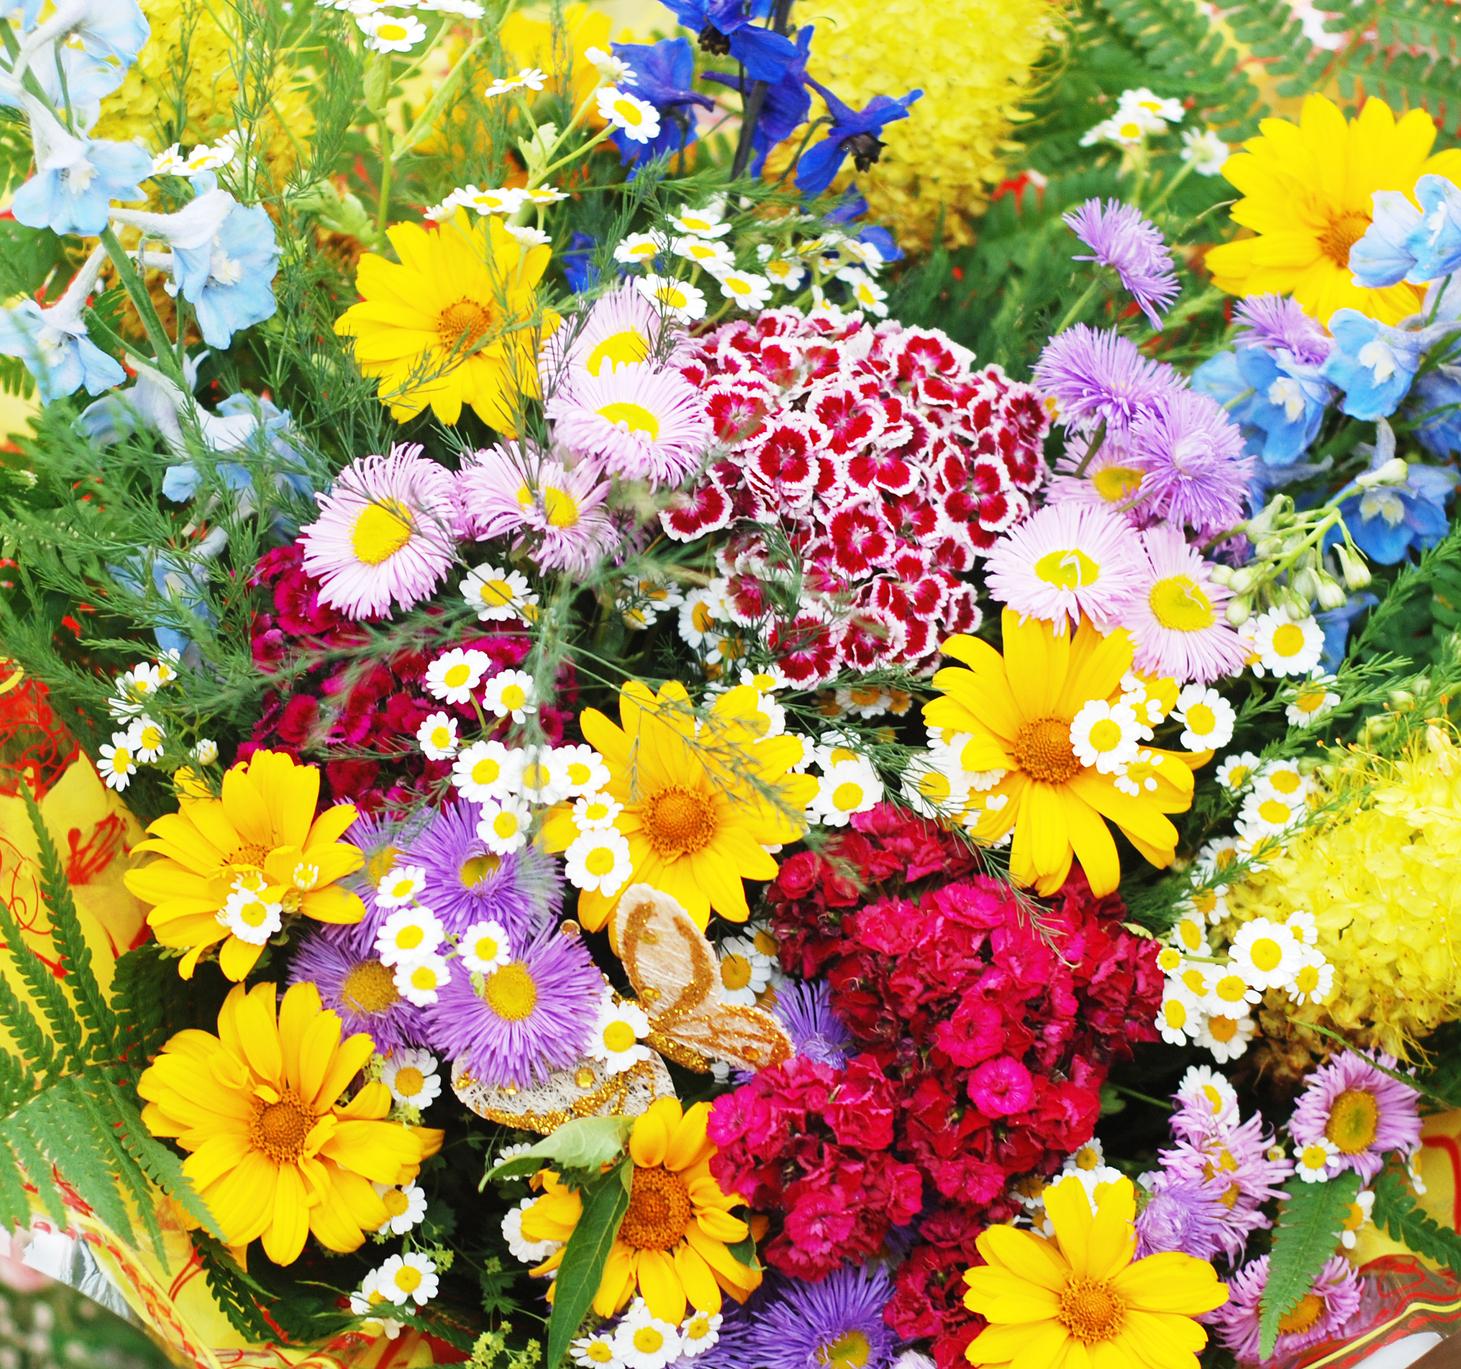 fotografias de paisajes de flores Fotografias y fotos para  - Fotos De Flores Multicolores